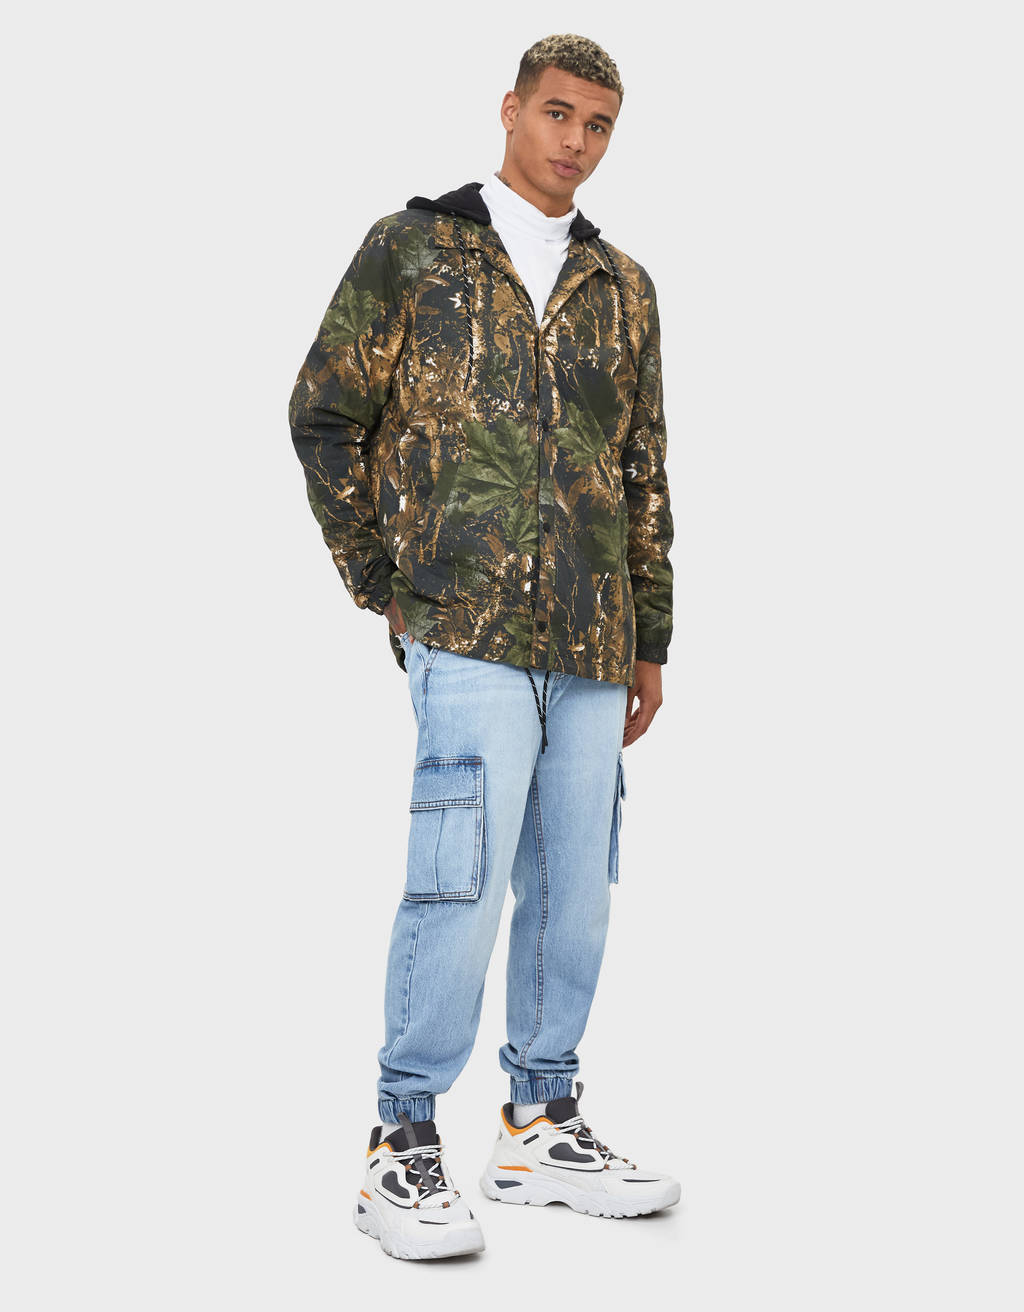 Coach jacket with detachable hood